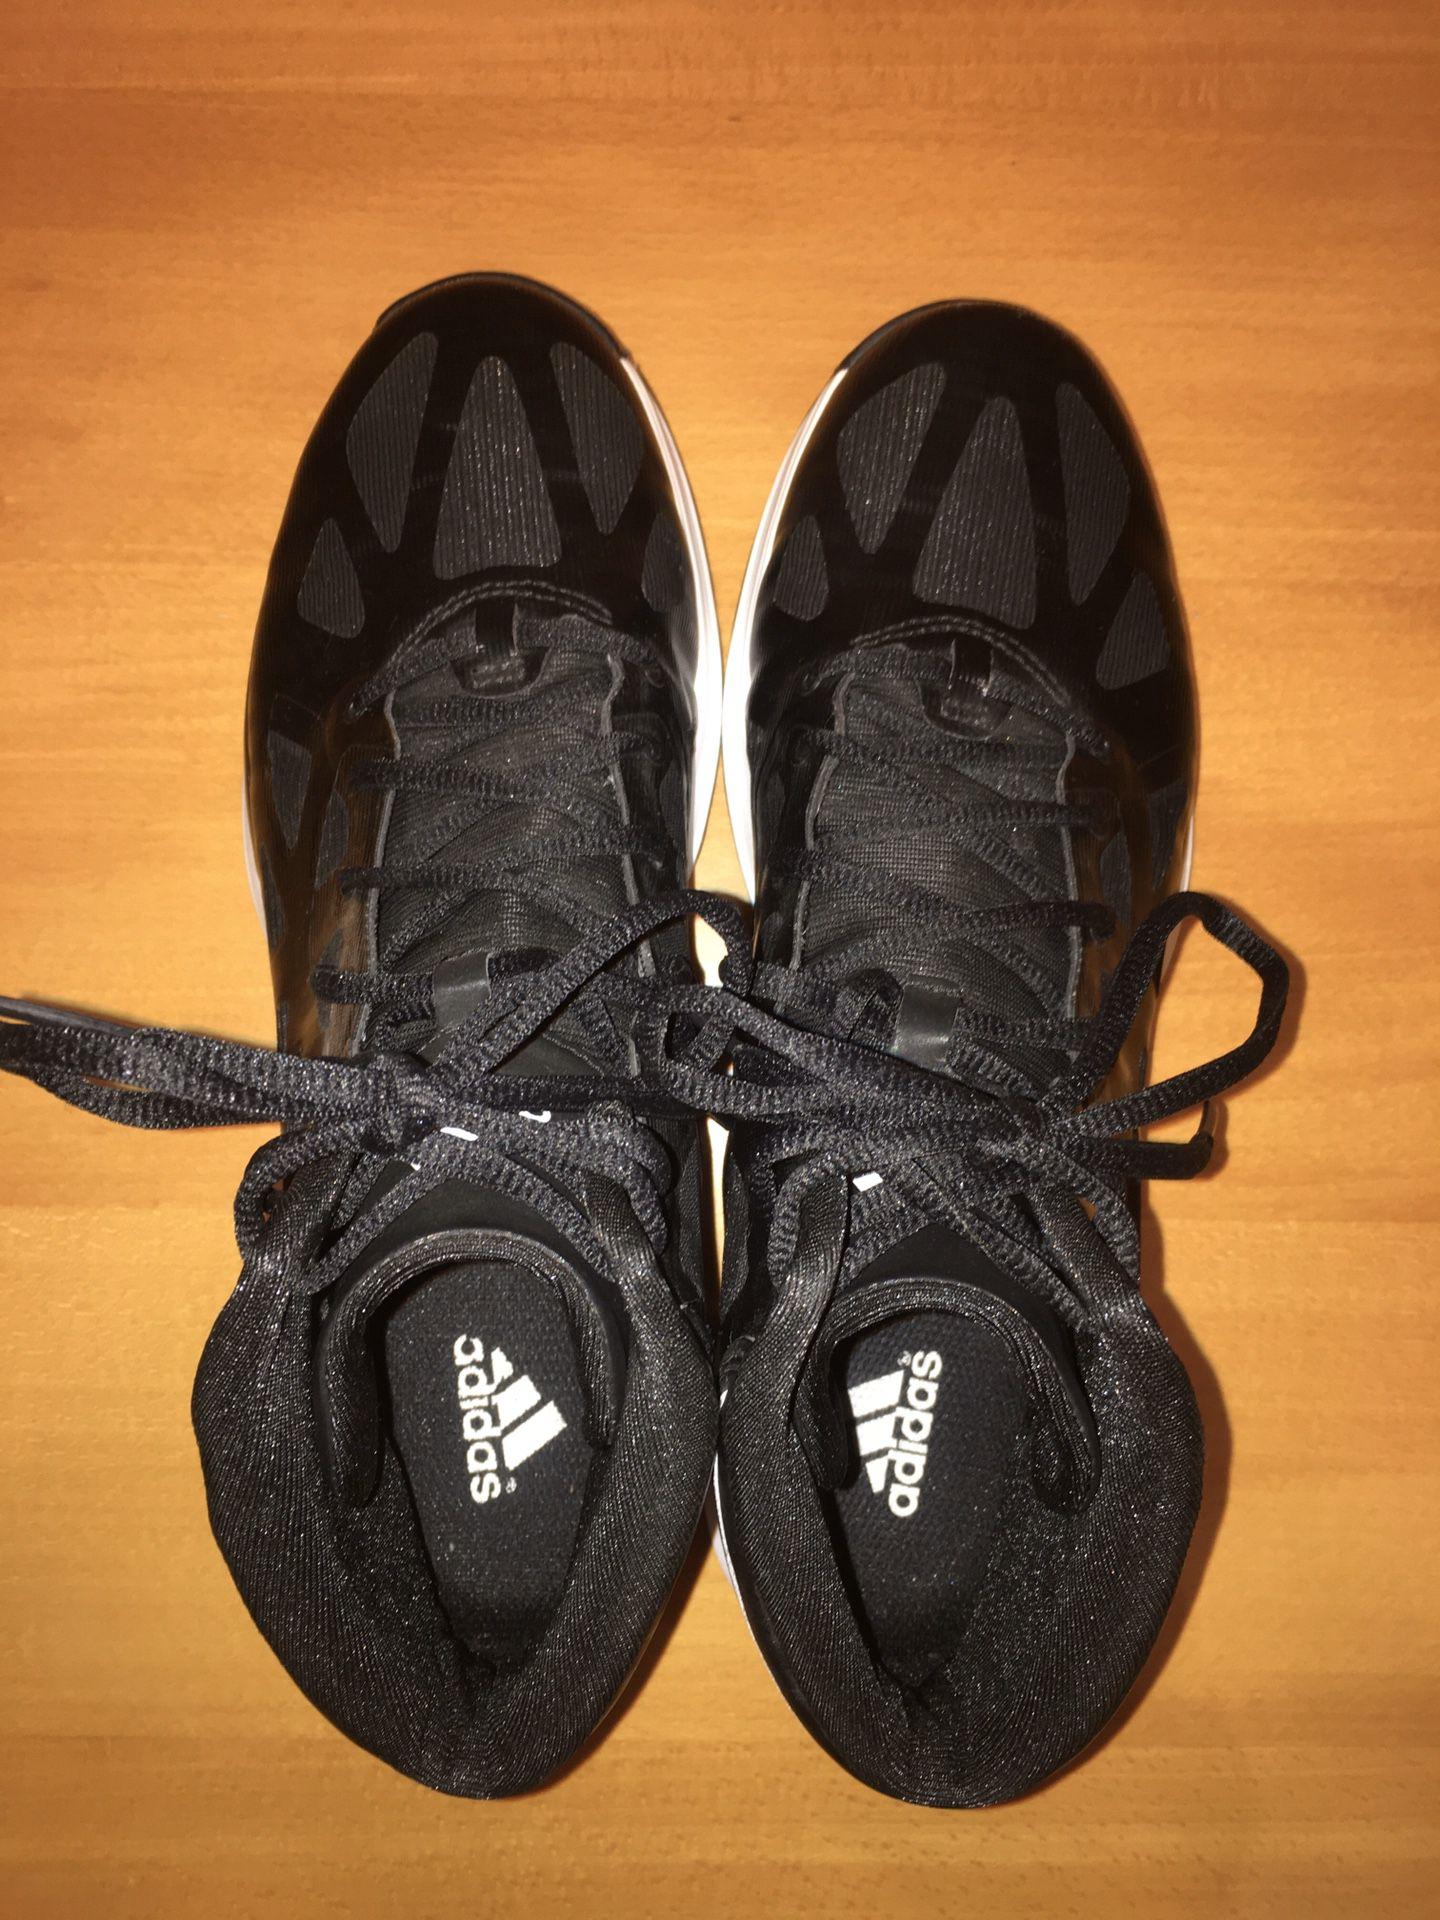 Adidas Crazy Shadow 2.0 Basketball Shoes